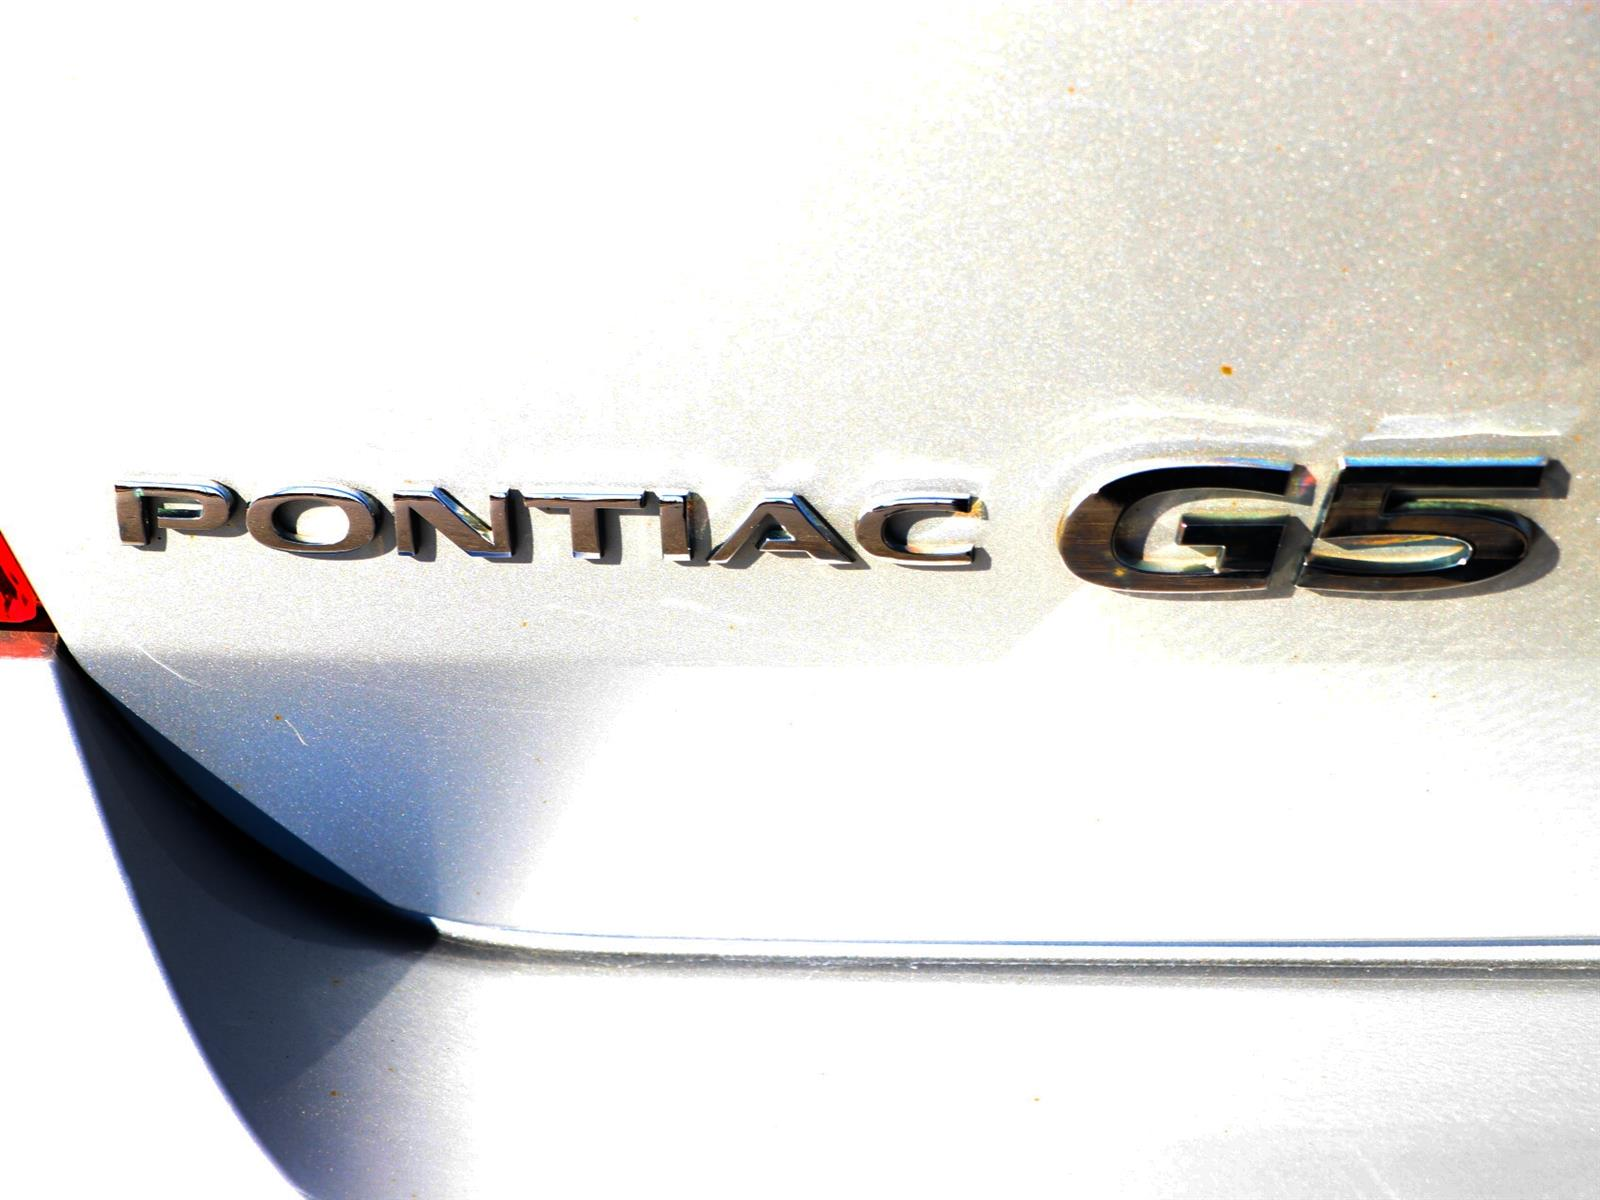 Used 2008 Pontiac G5 in London,ON